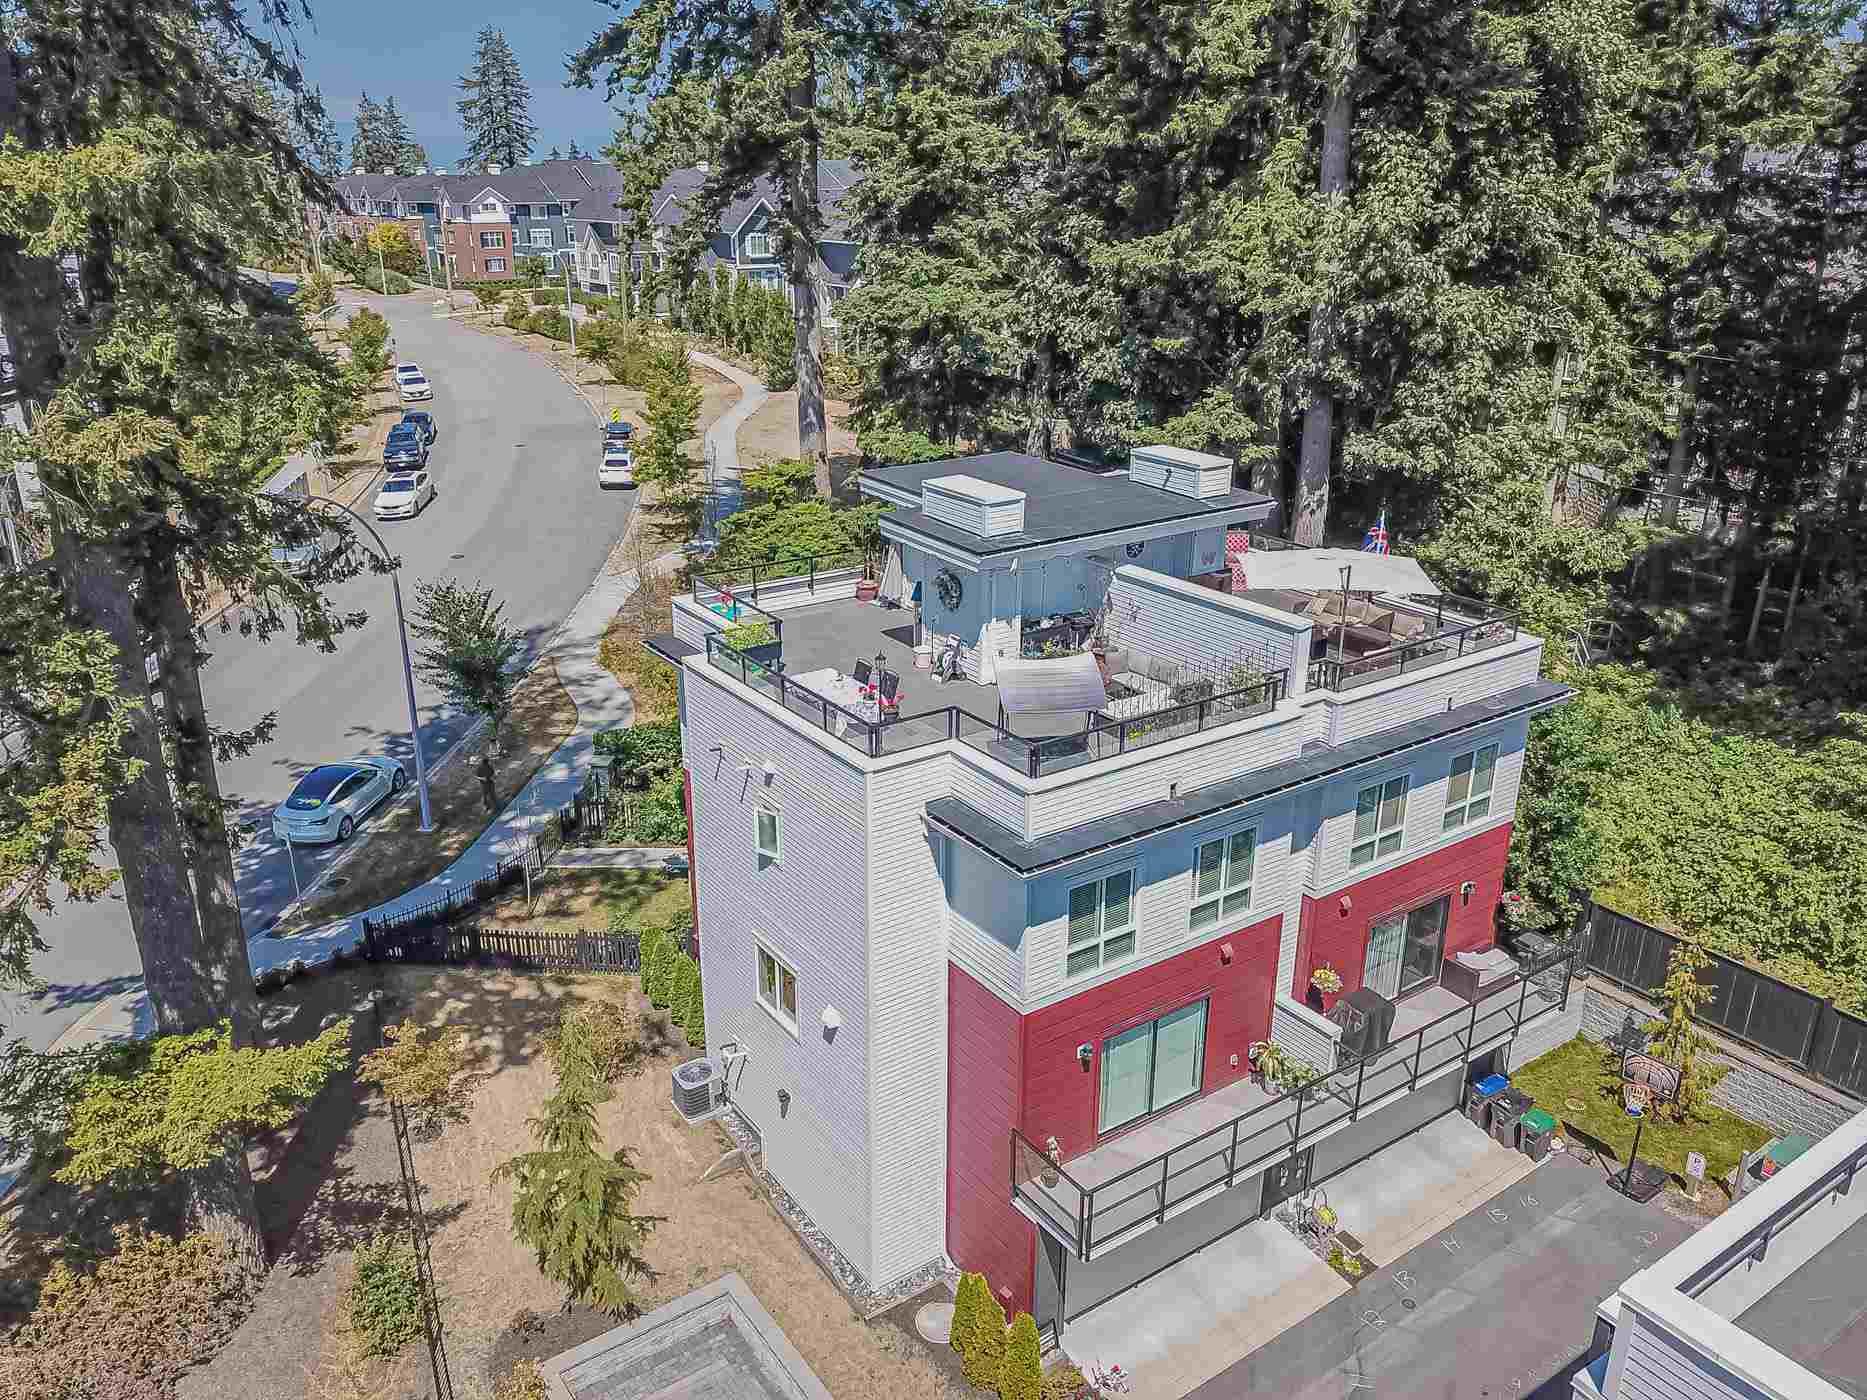 235 2218 OAK MEADOWS DRIVE - Grandview Surrey Townhouse for sale, 4 Bedrooms (R2623835)